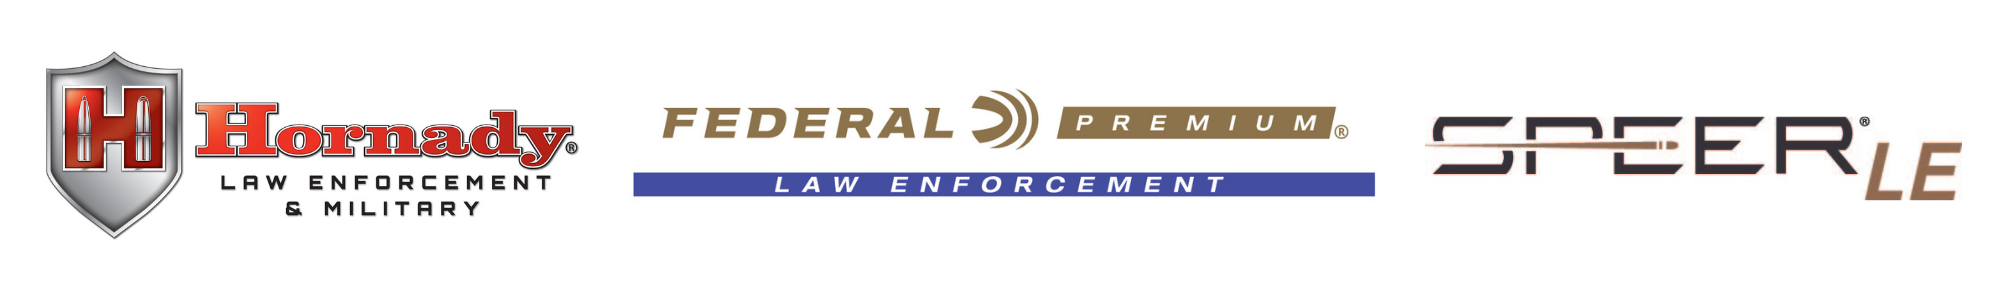 hornady-federal-premium-speer-le-ammunition-final.png